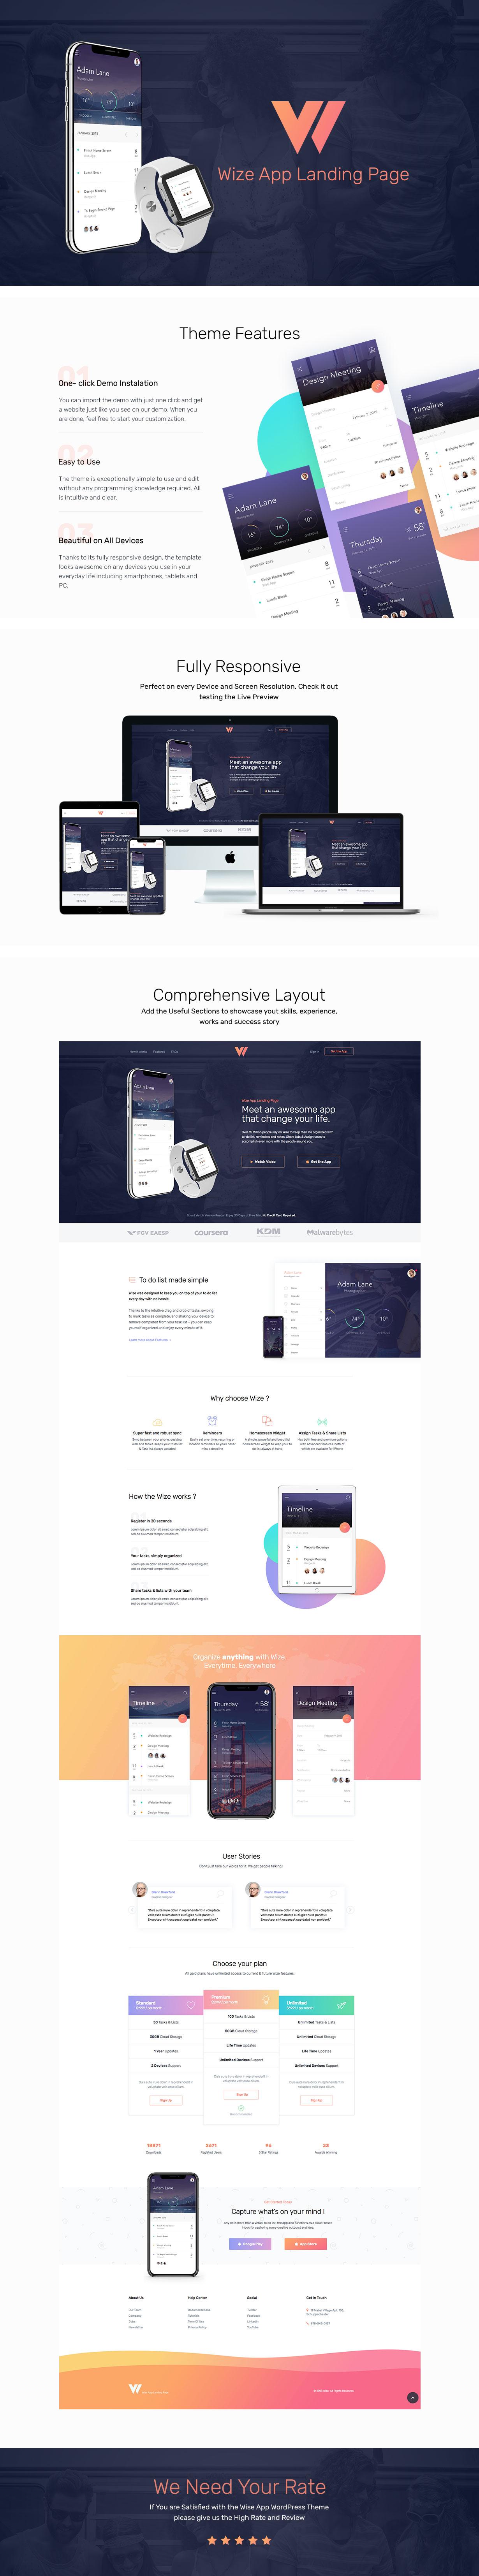 WizeApp - One Page App Landing WordPress Theme - 1